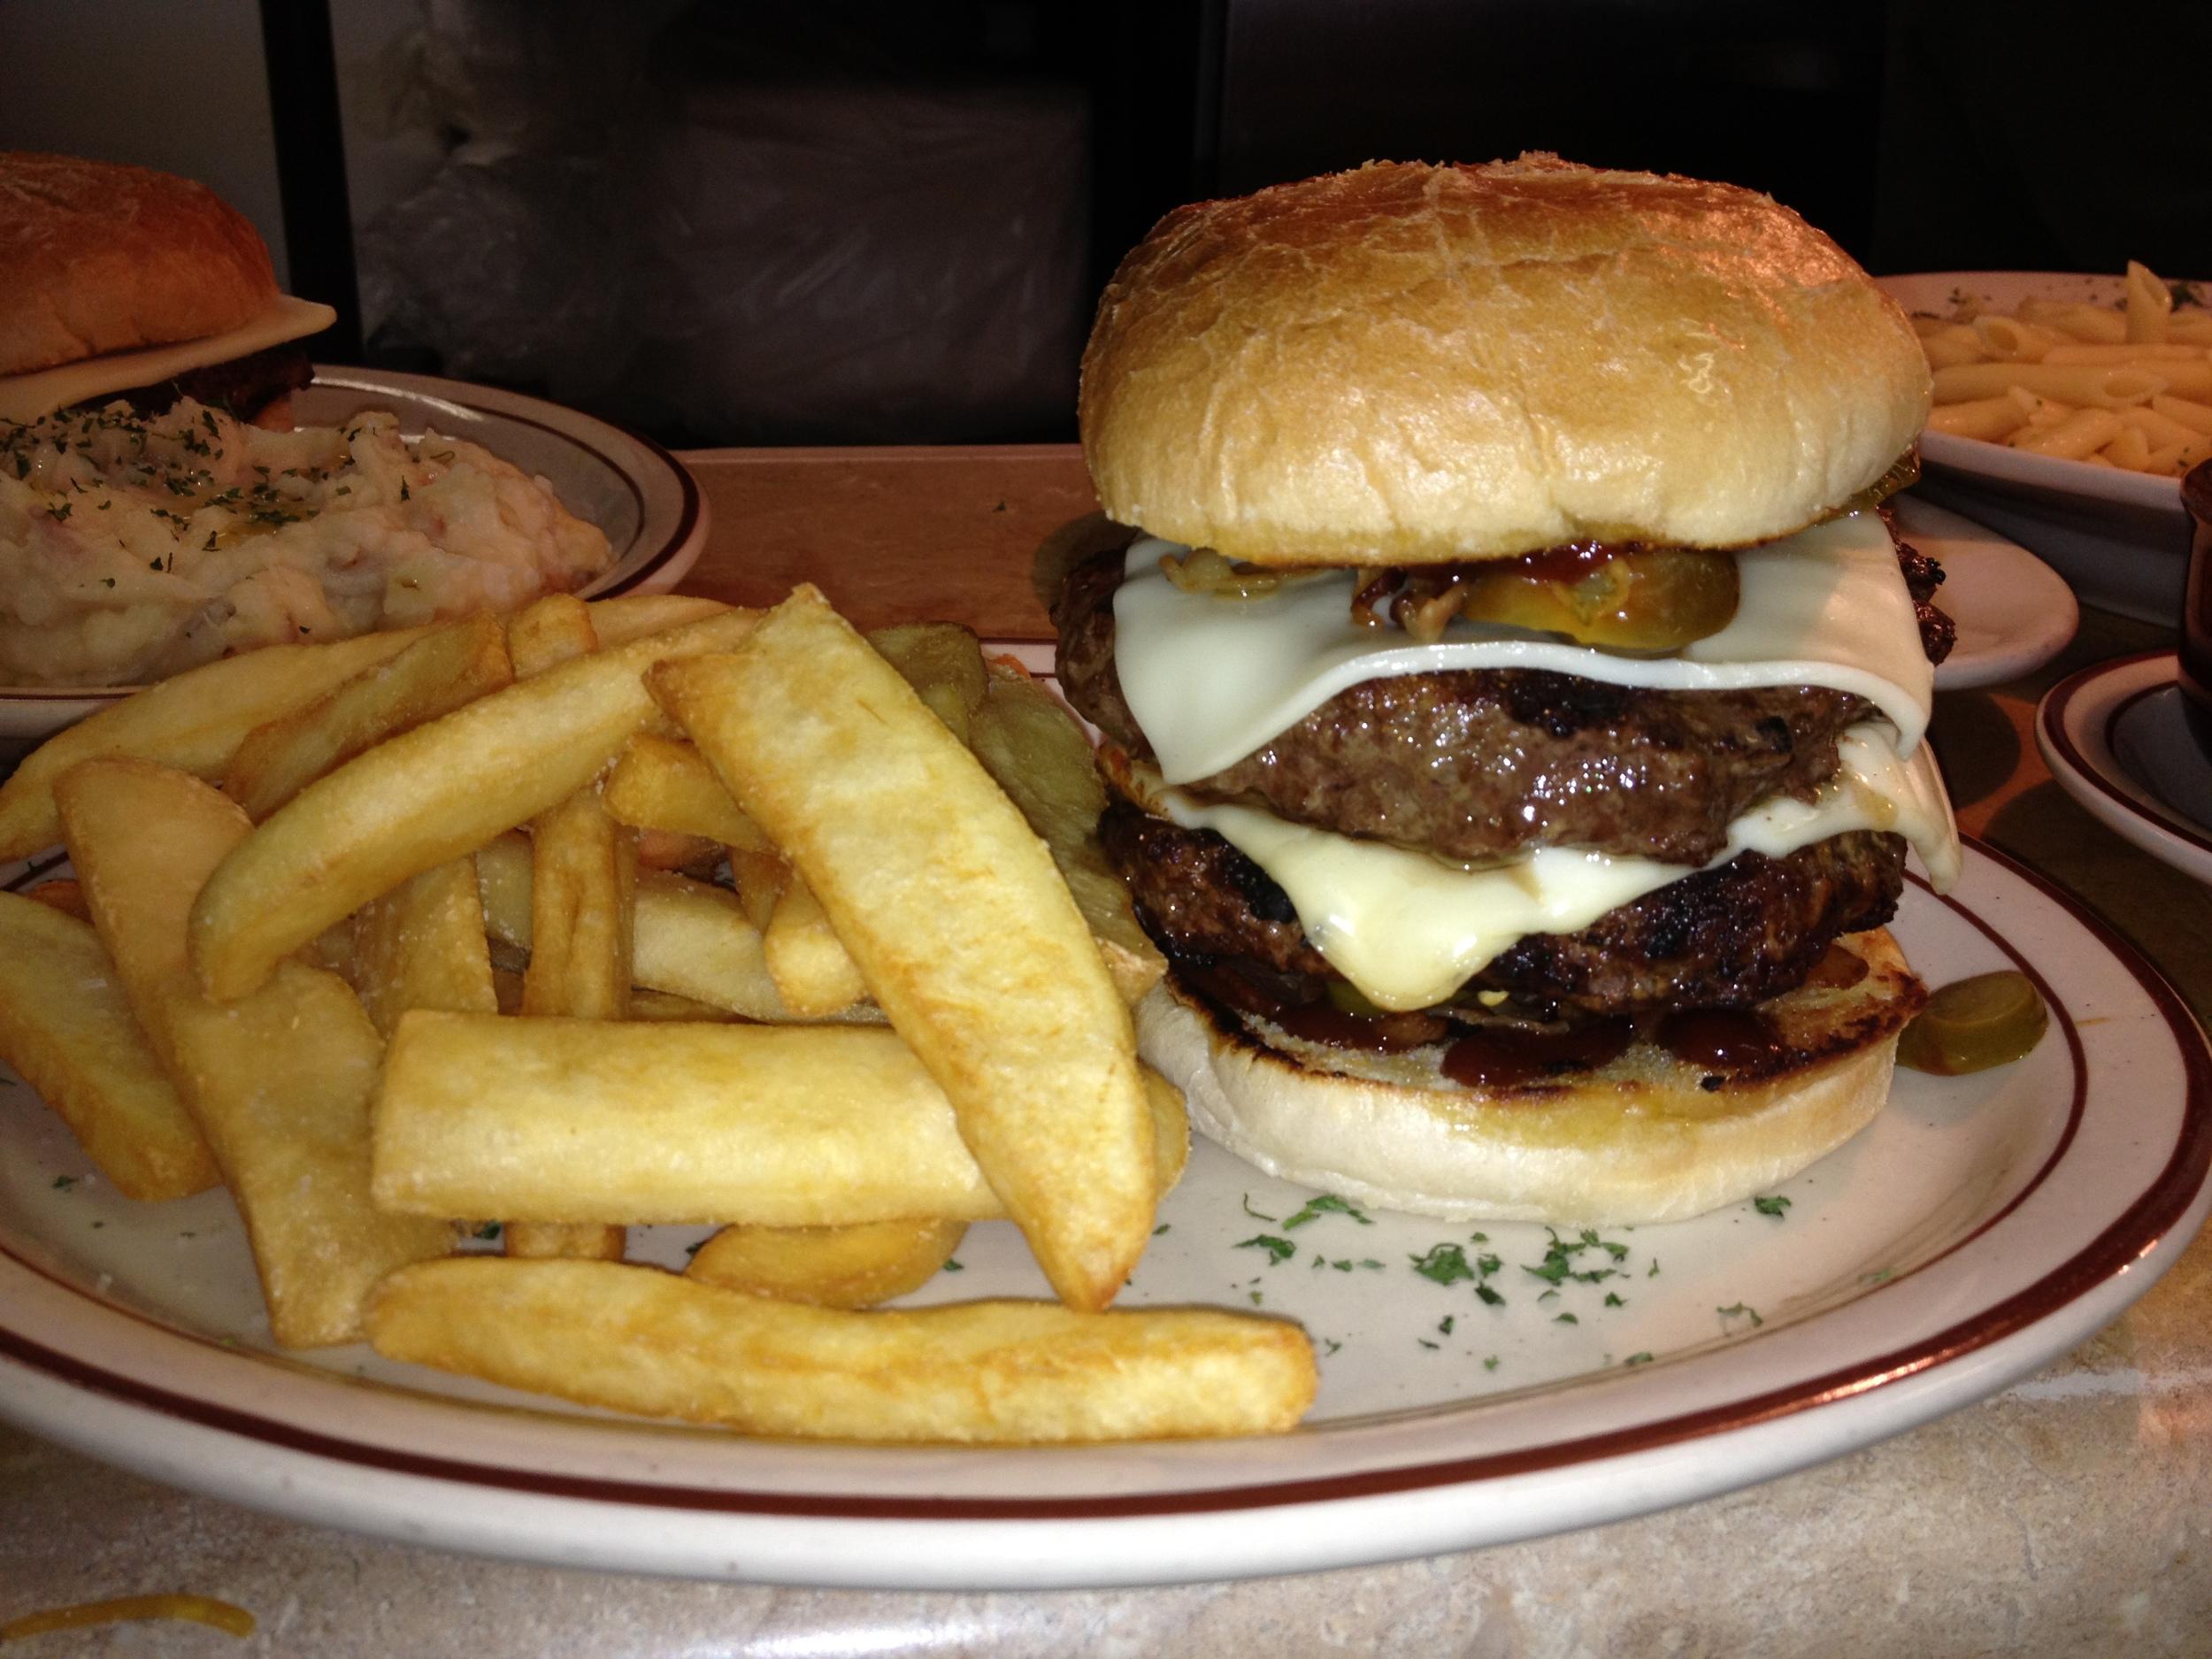 Double Decker 1 Pound Burger